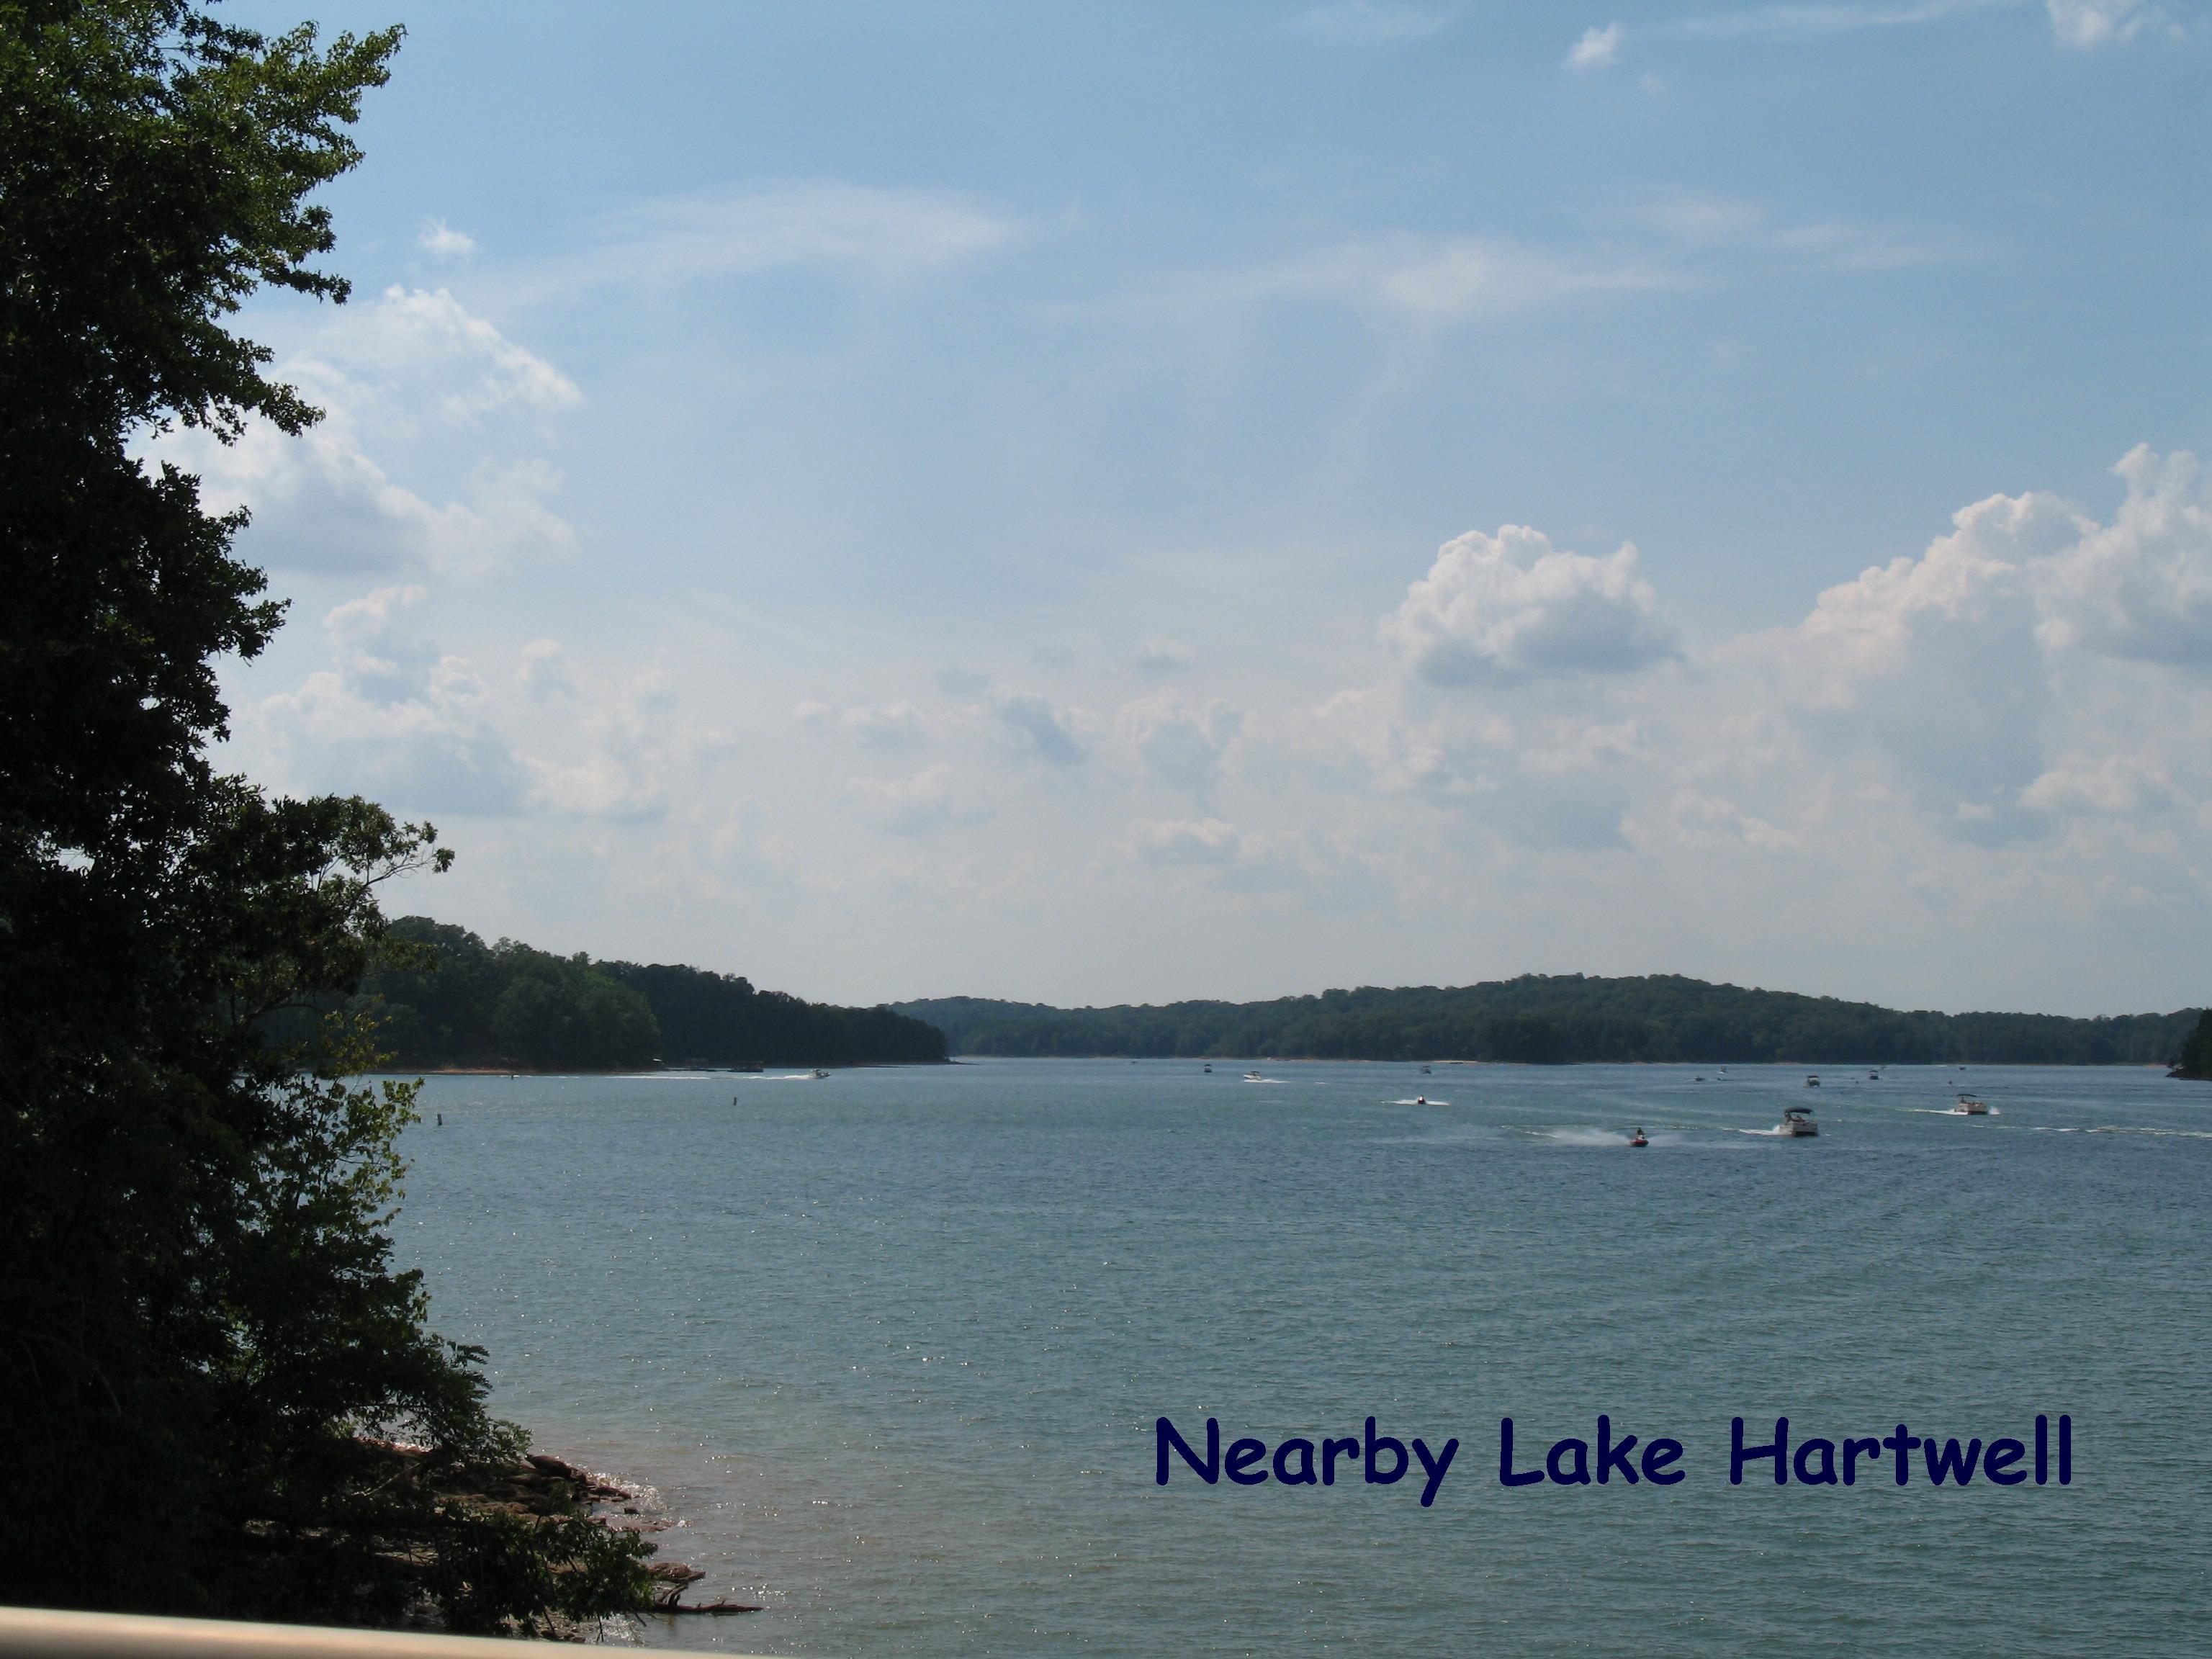 Anderson / Lake Hartwell KOA Holiday image 14